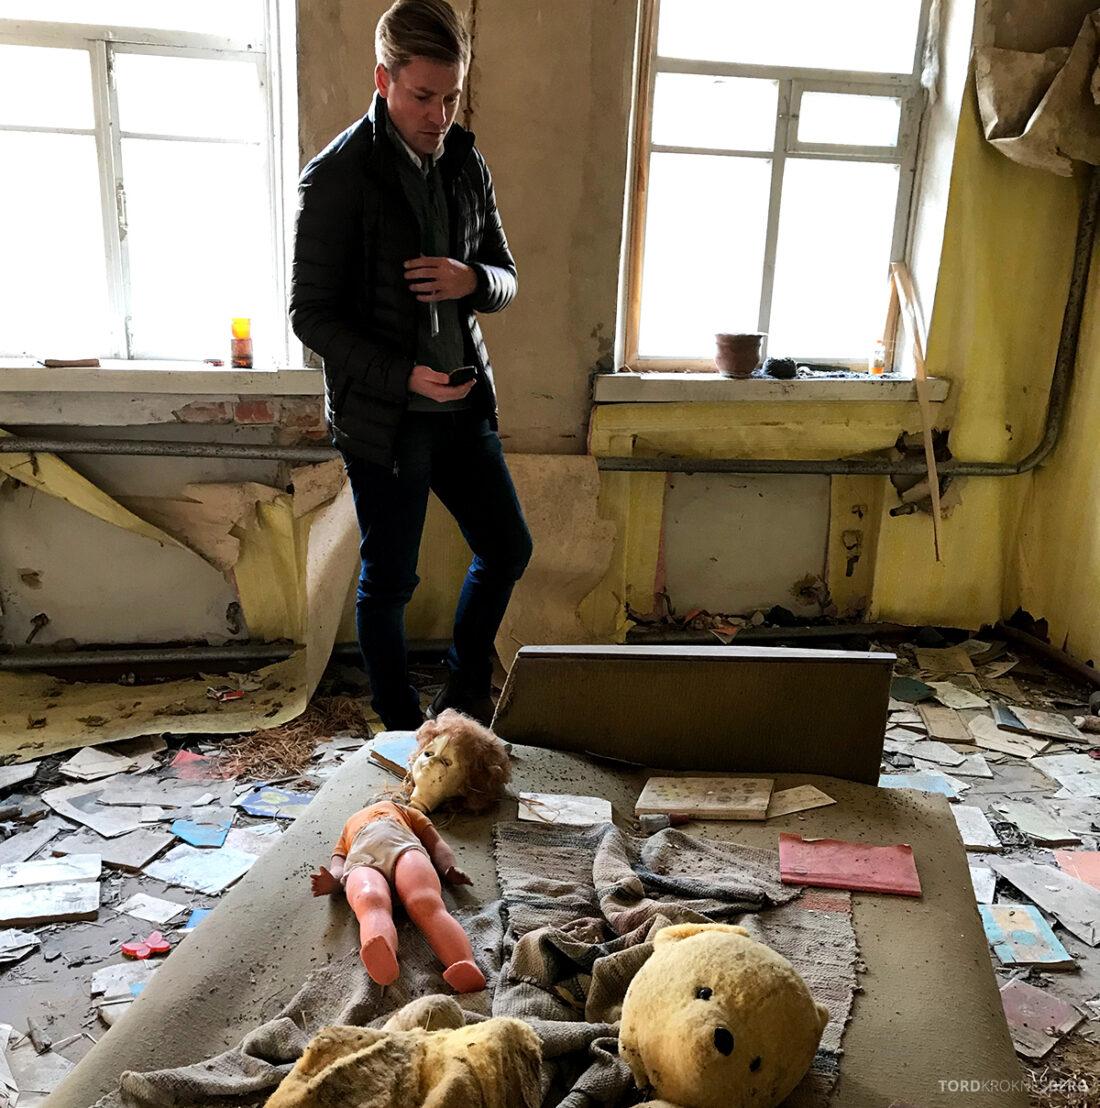 Chernobyl Pripyat Tour Tord Kroknes Berg dukke